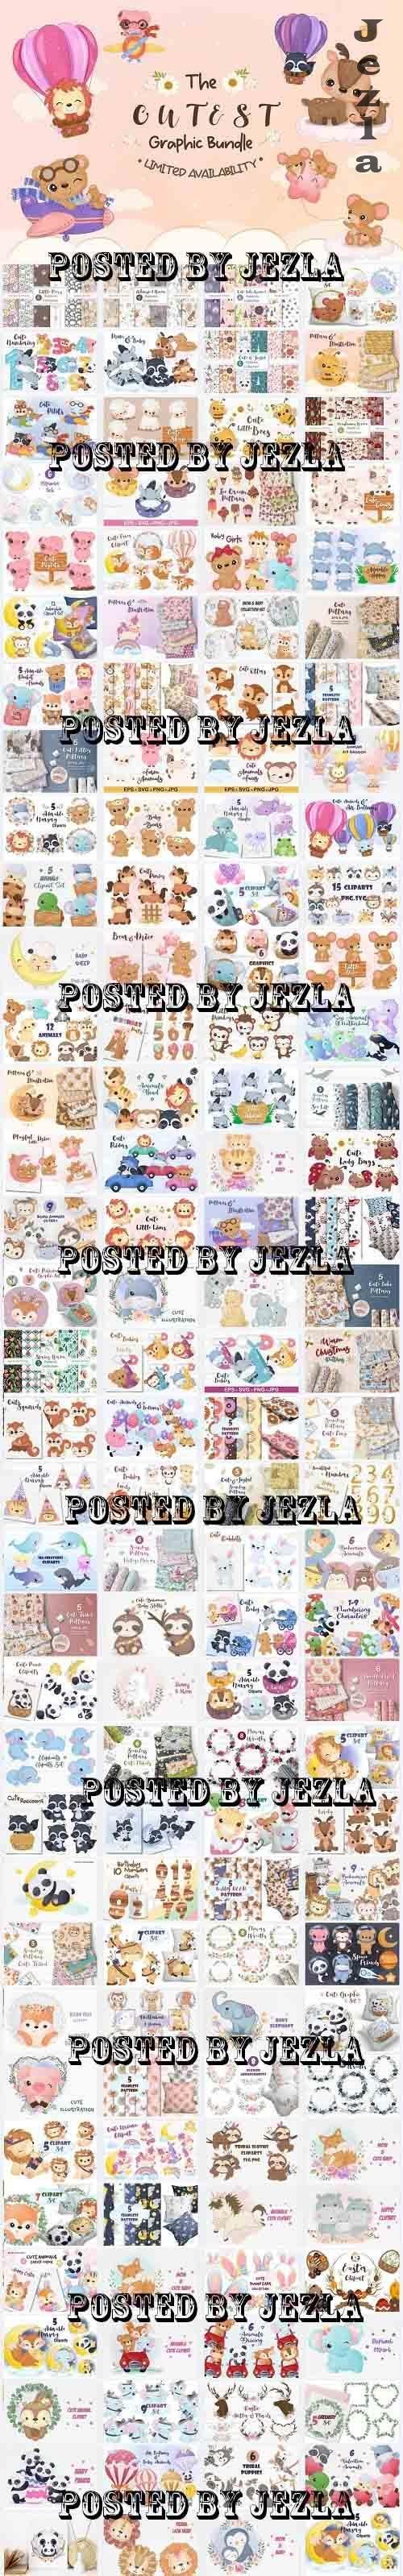 Cute Animals & Patterns Bundle - 139 Premium Graphics